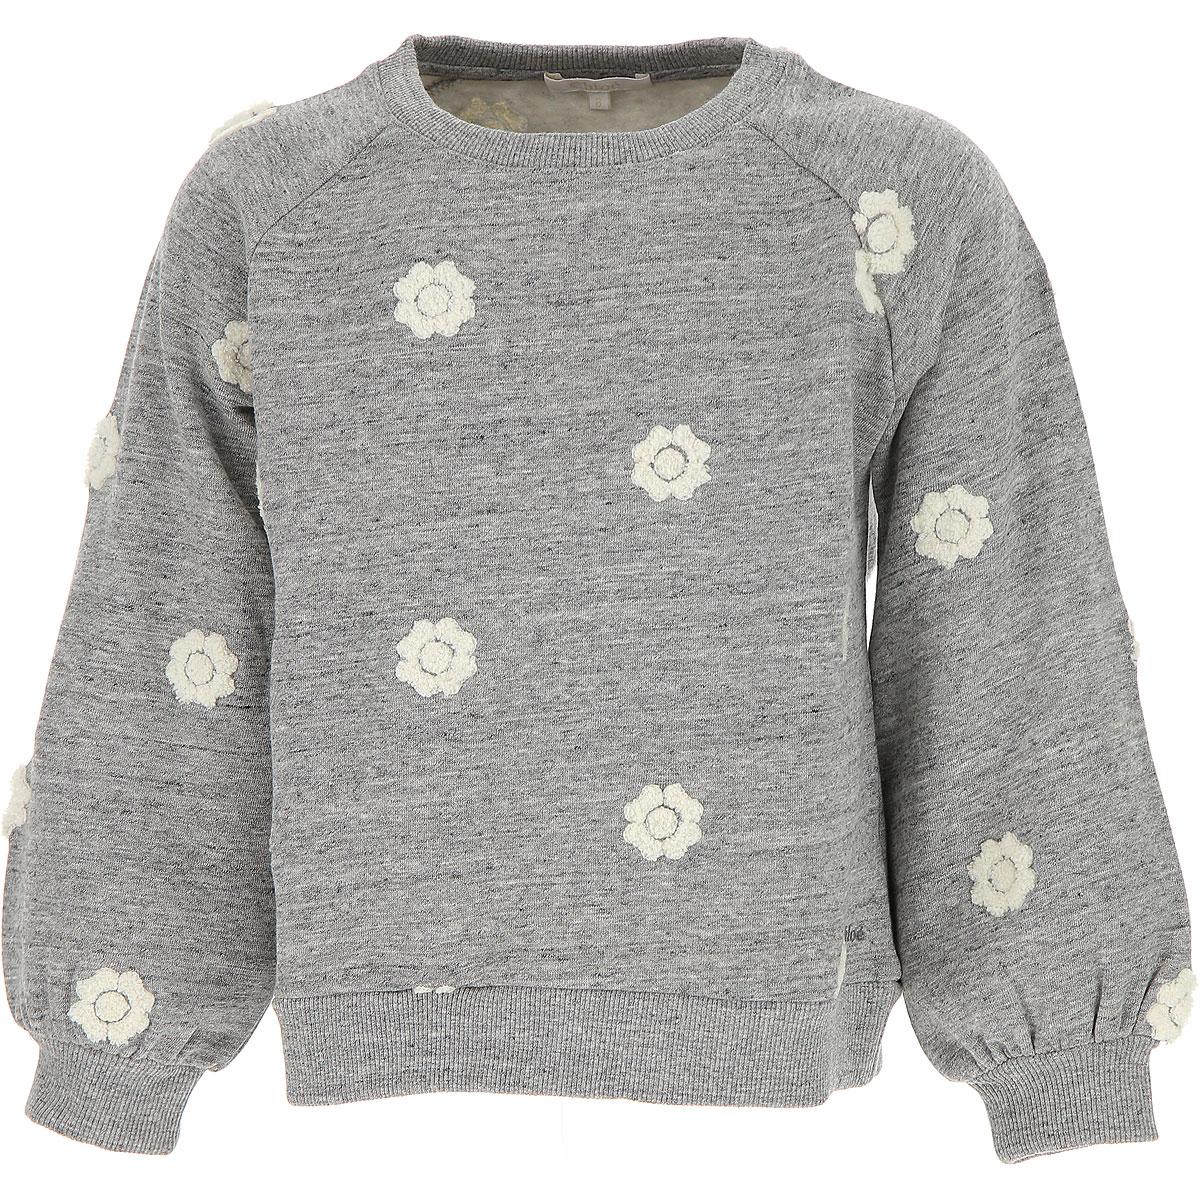 Image of Chloe Kids Sweatshirts & Hoodies for Girls, Grey, Cotton, 2017, 10Y 14Y 4Y 5Y 6Y 8Y